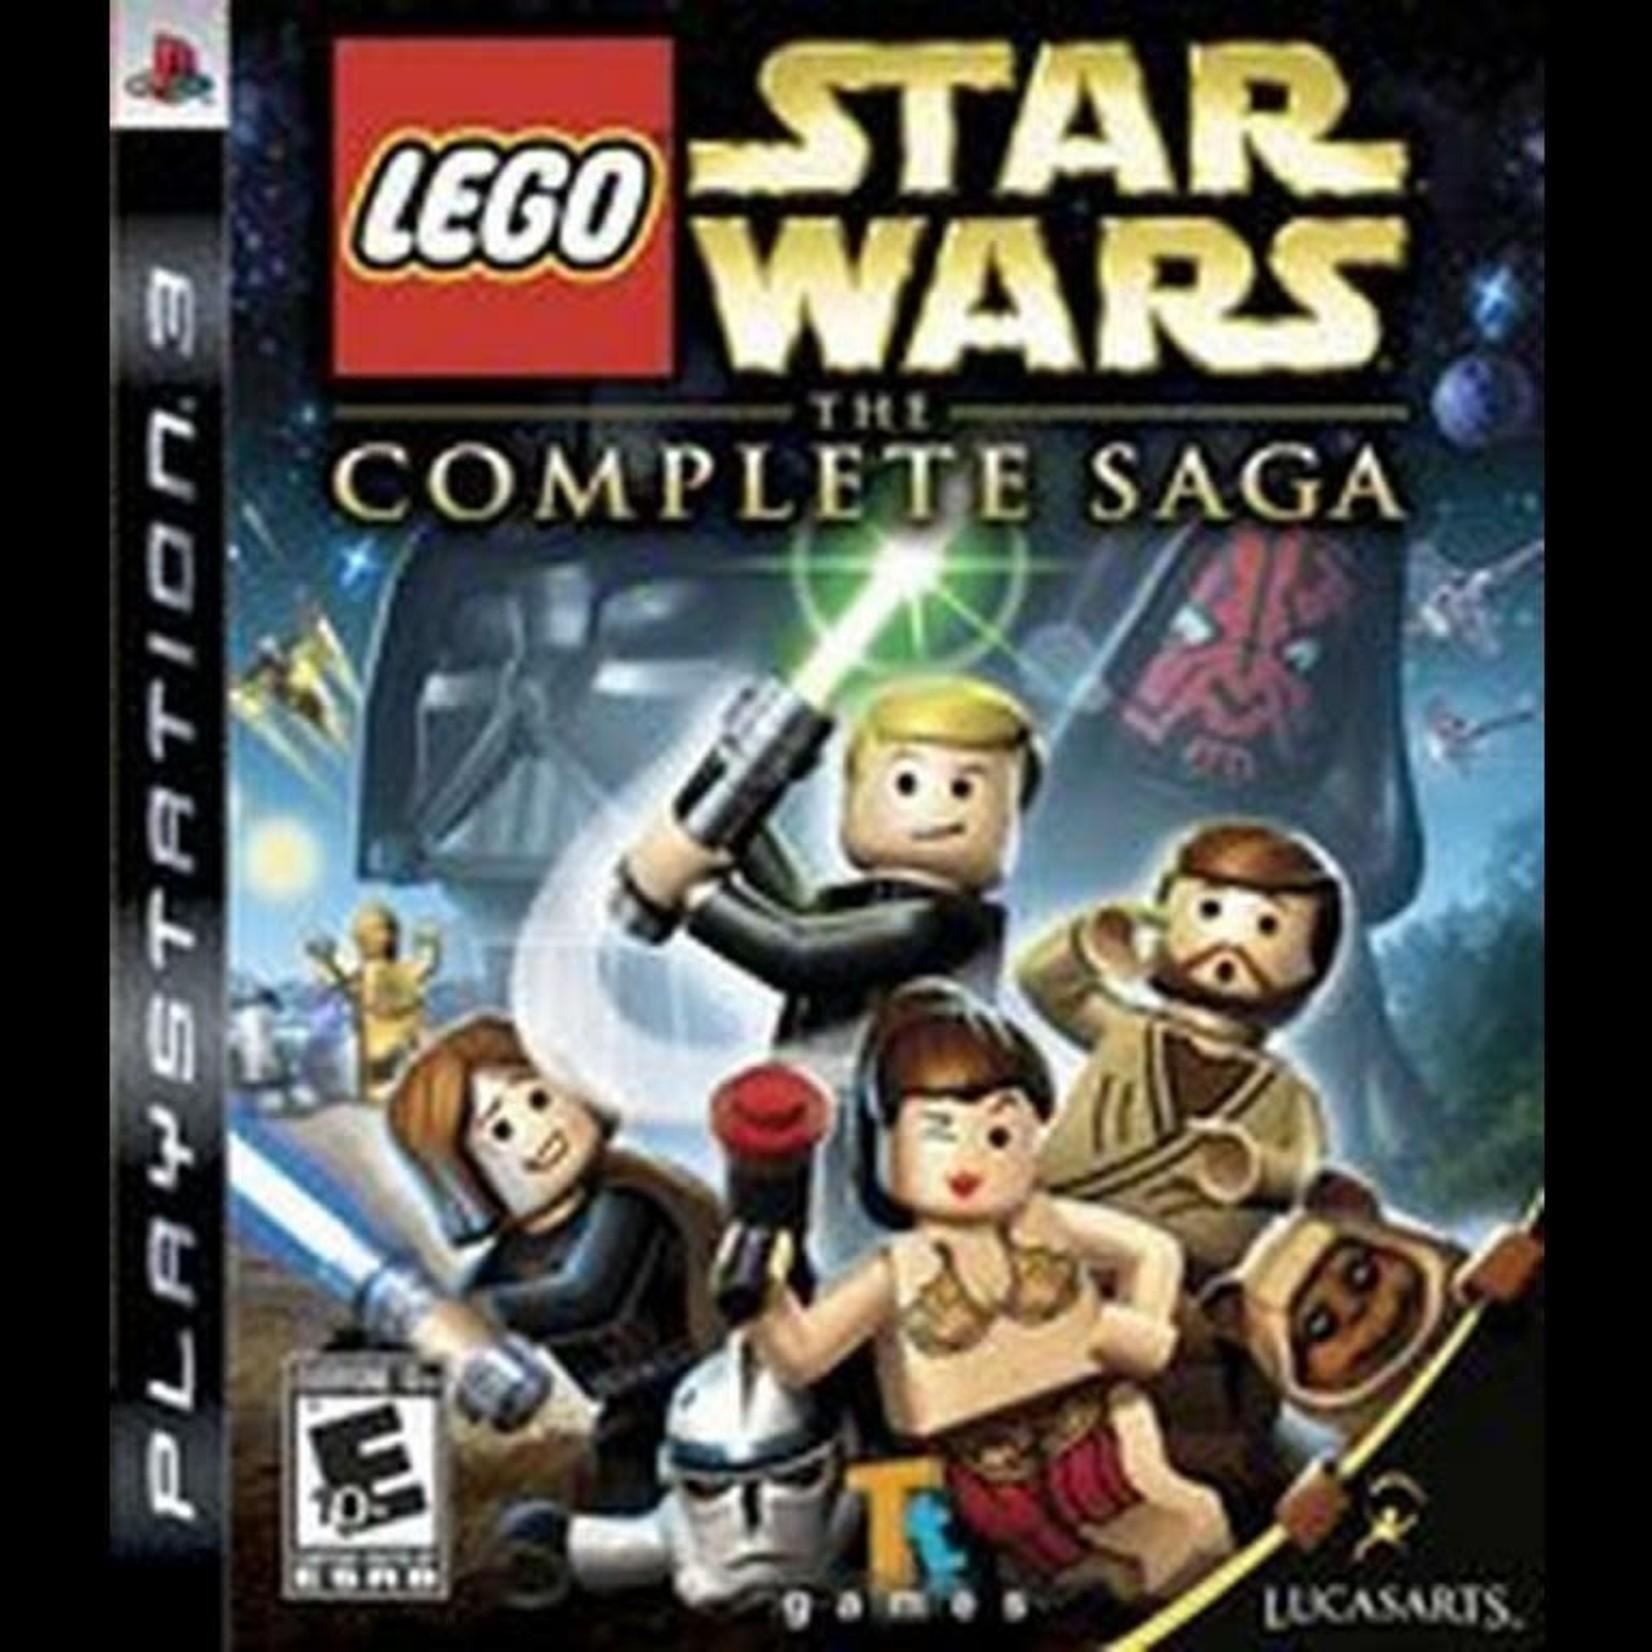 PS3U-LEGO STAR WARS: THE COMPLETE SAGA